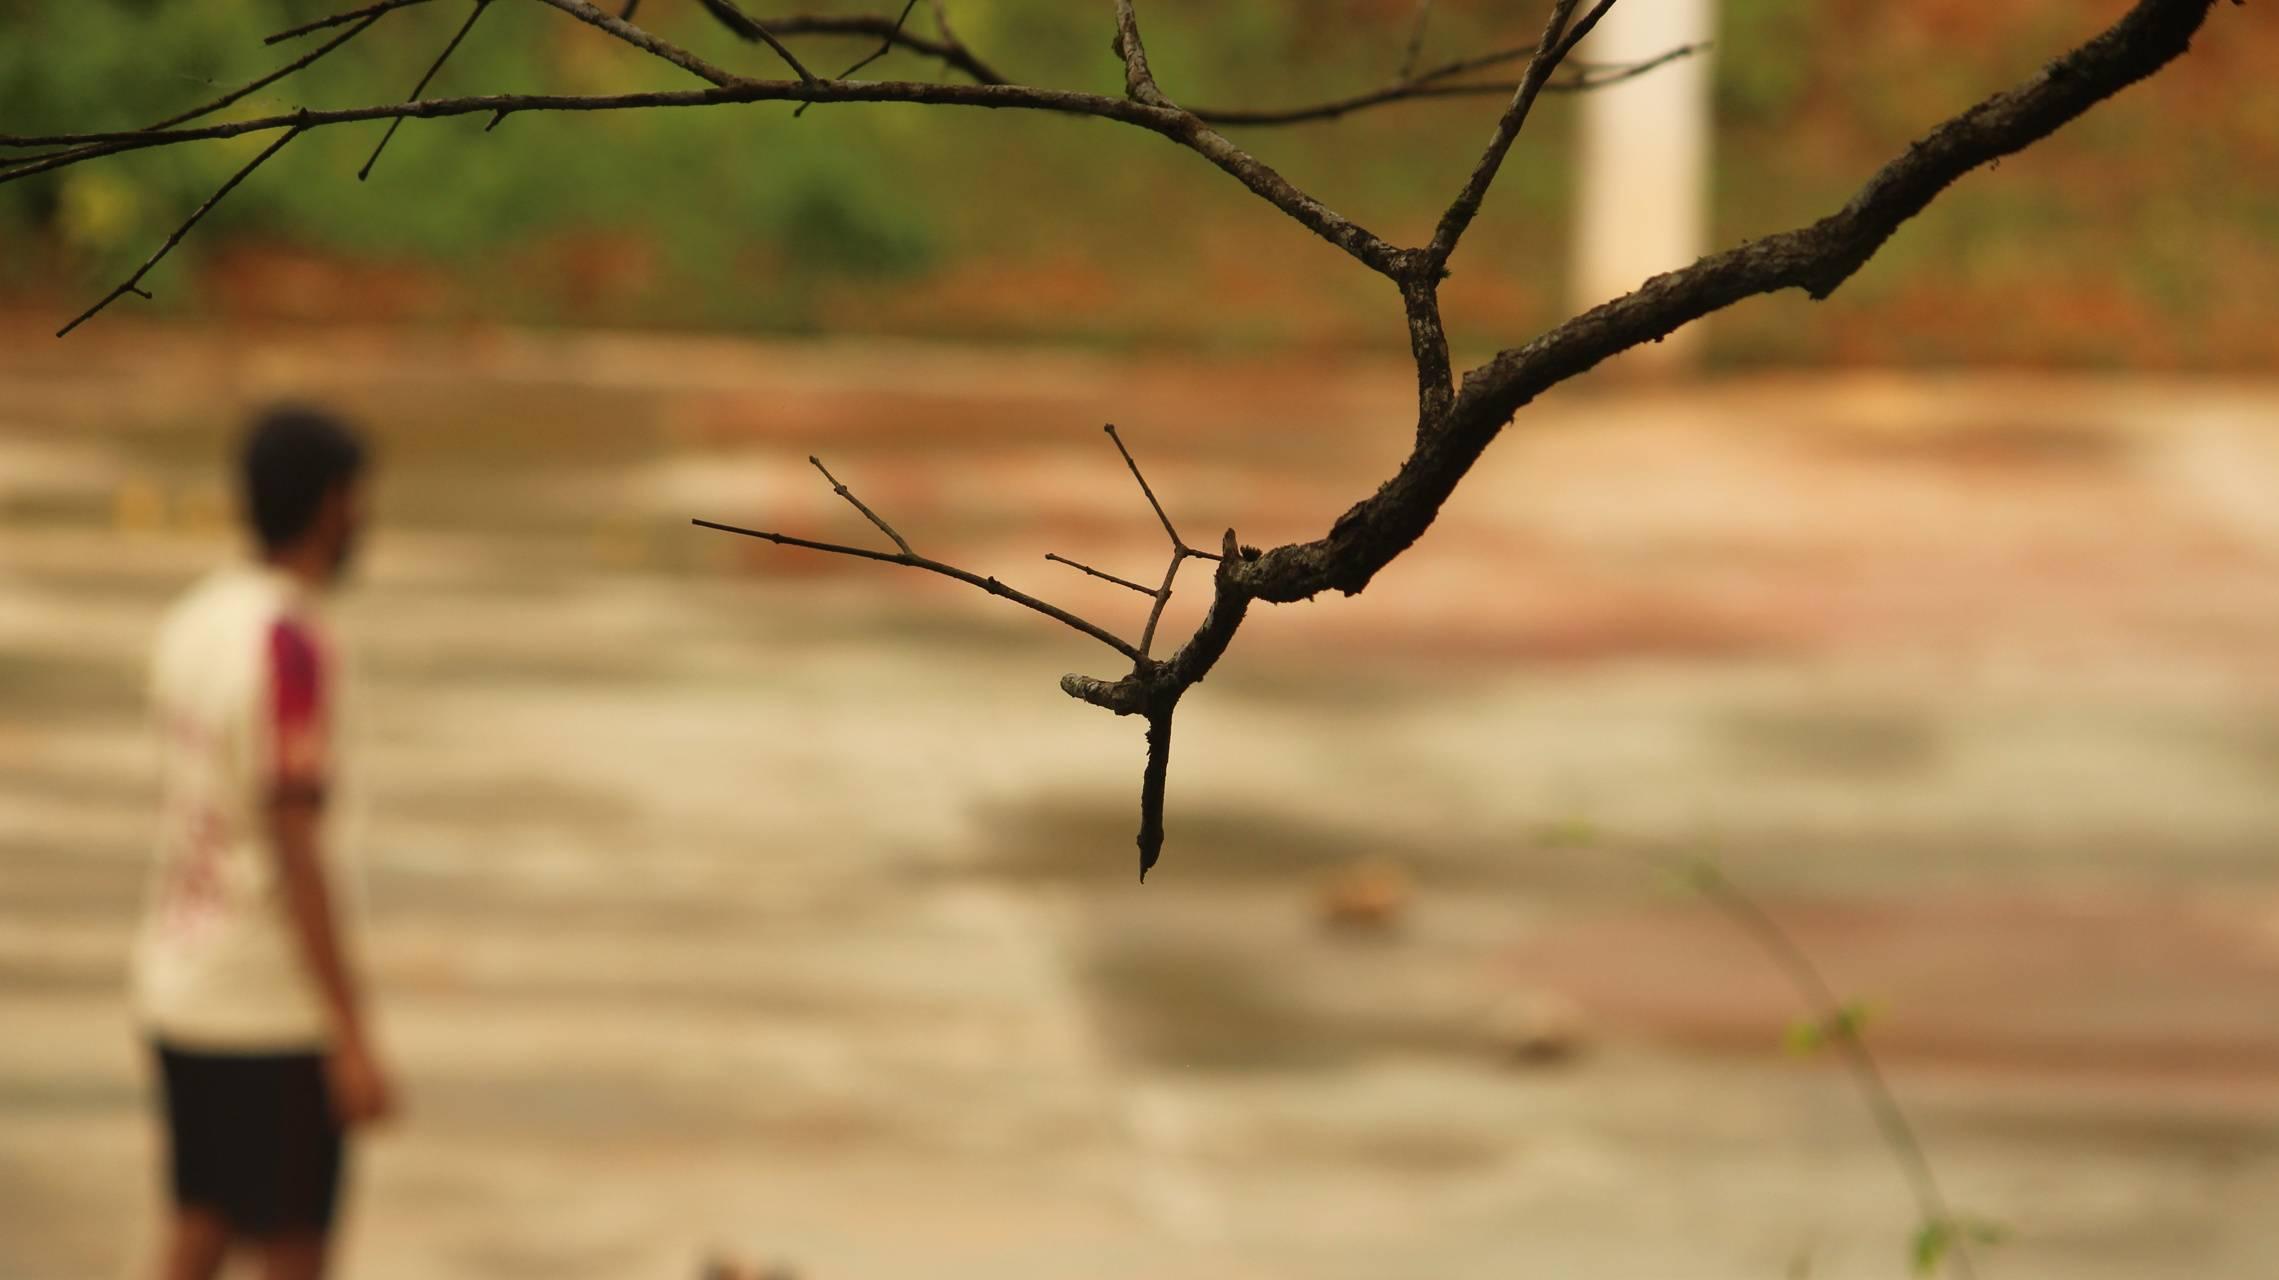 Leafless branchs